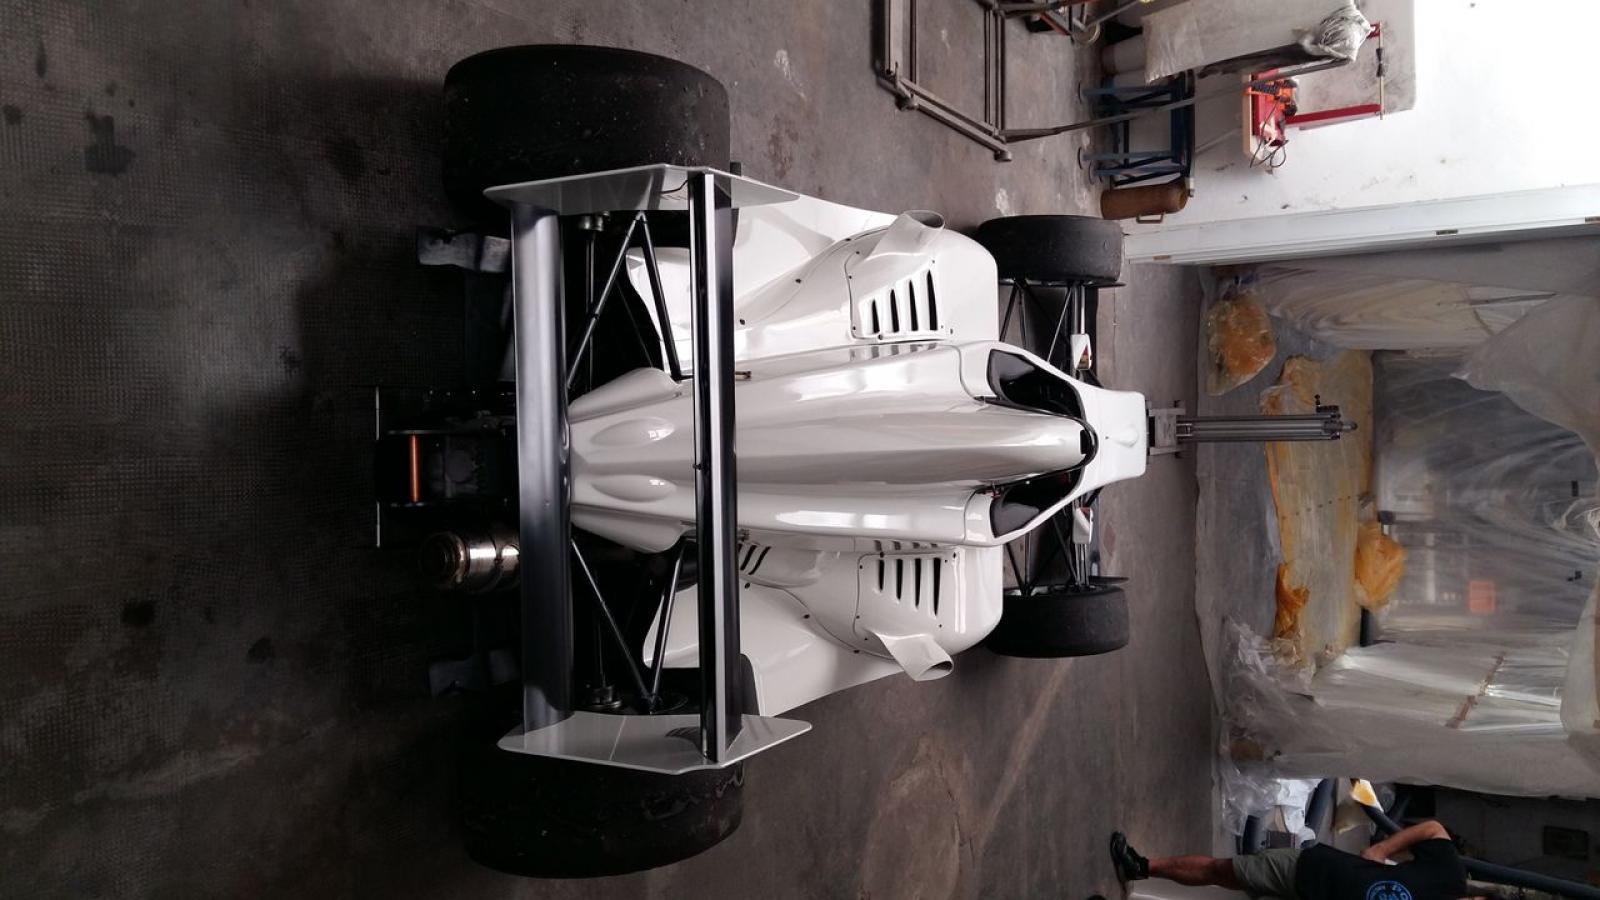 Formula Renault 2.0 - 3